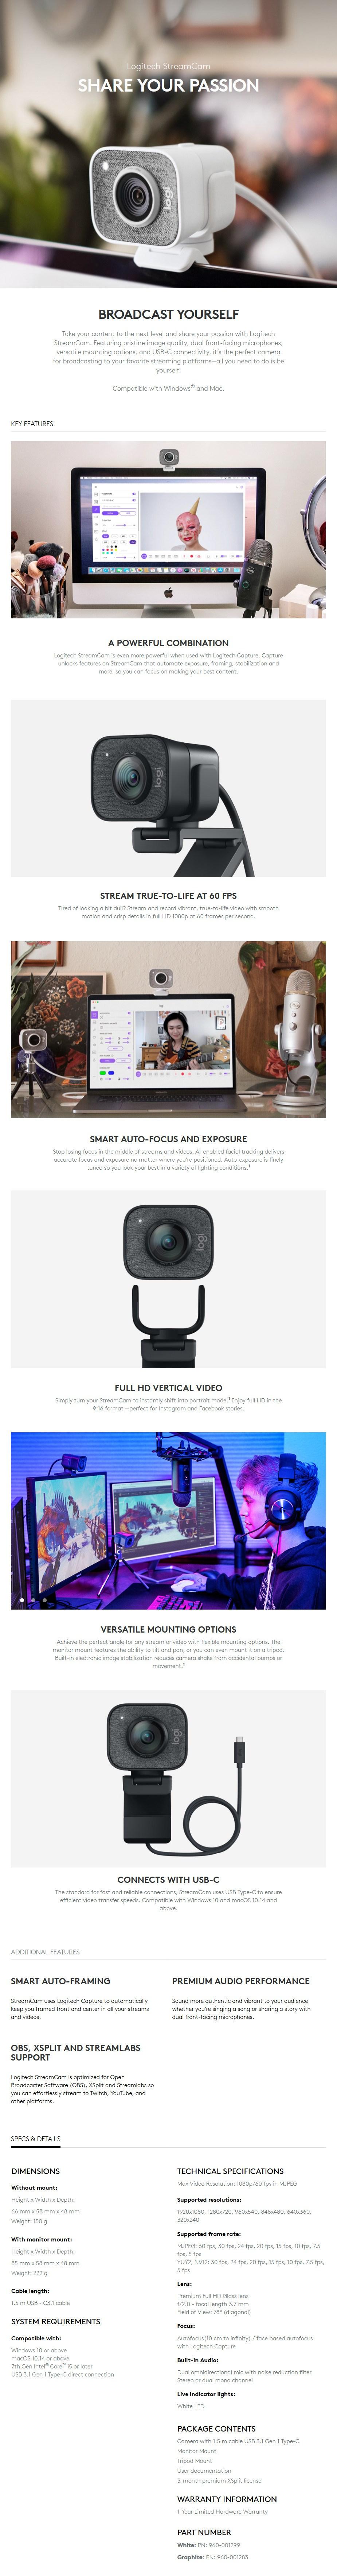 Logitech StreamCam Full HD USB-C Webcam - Off-White - Overview 1